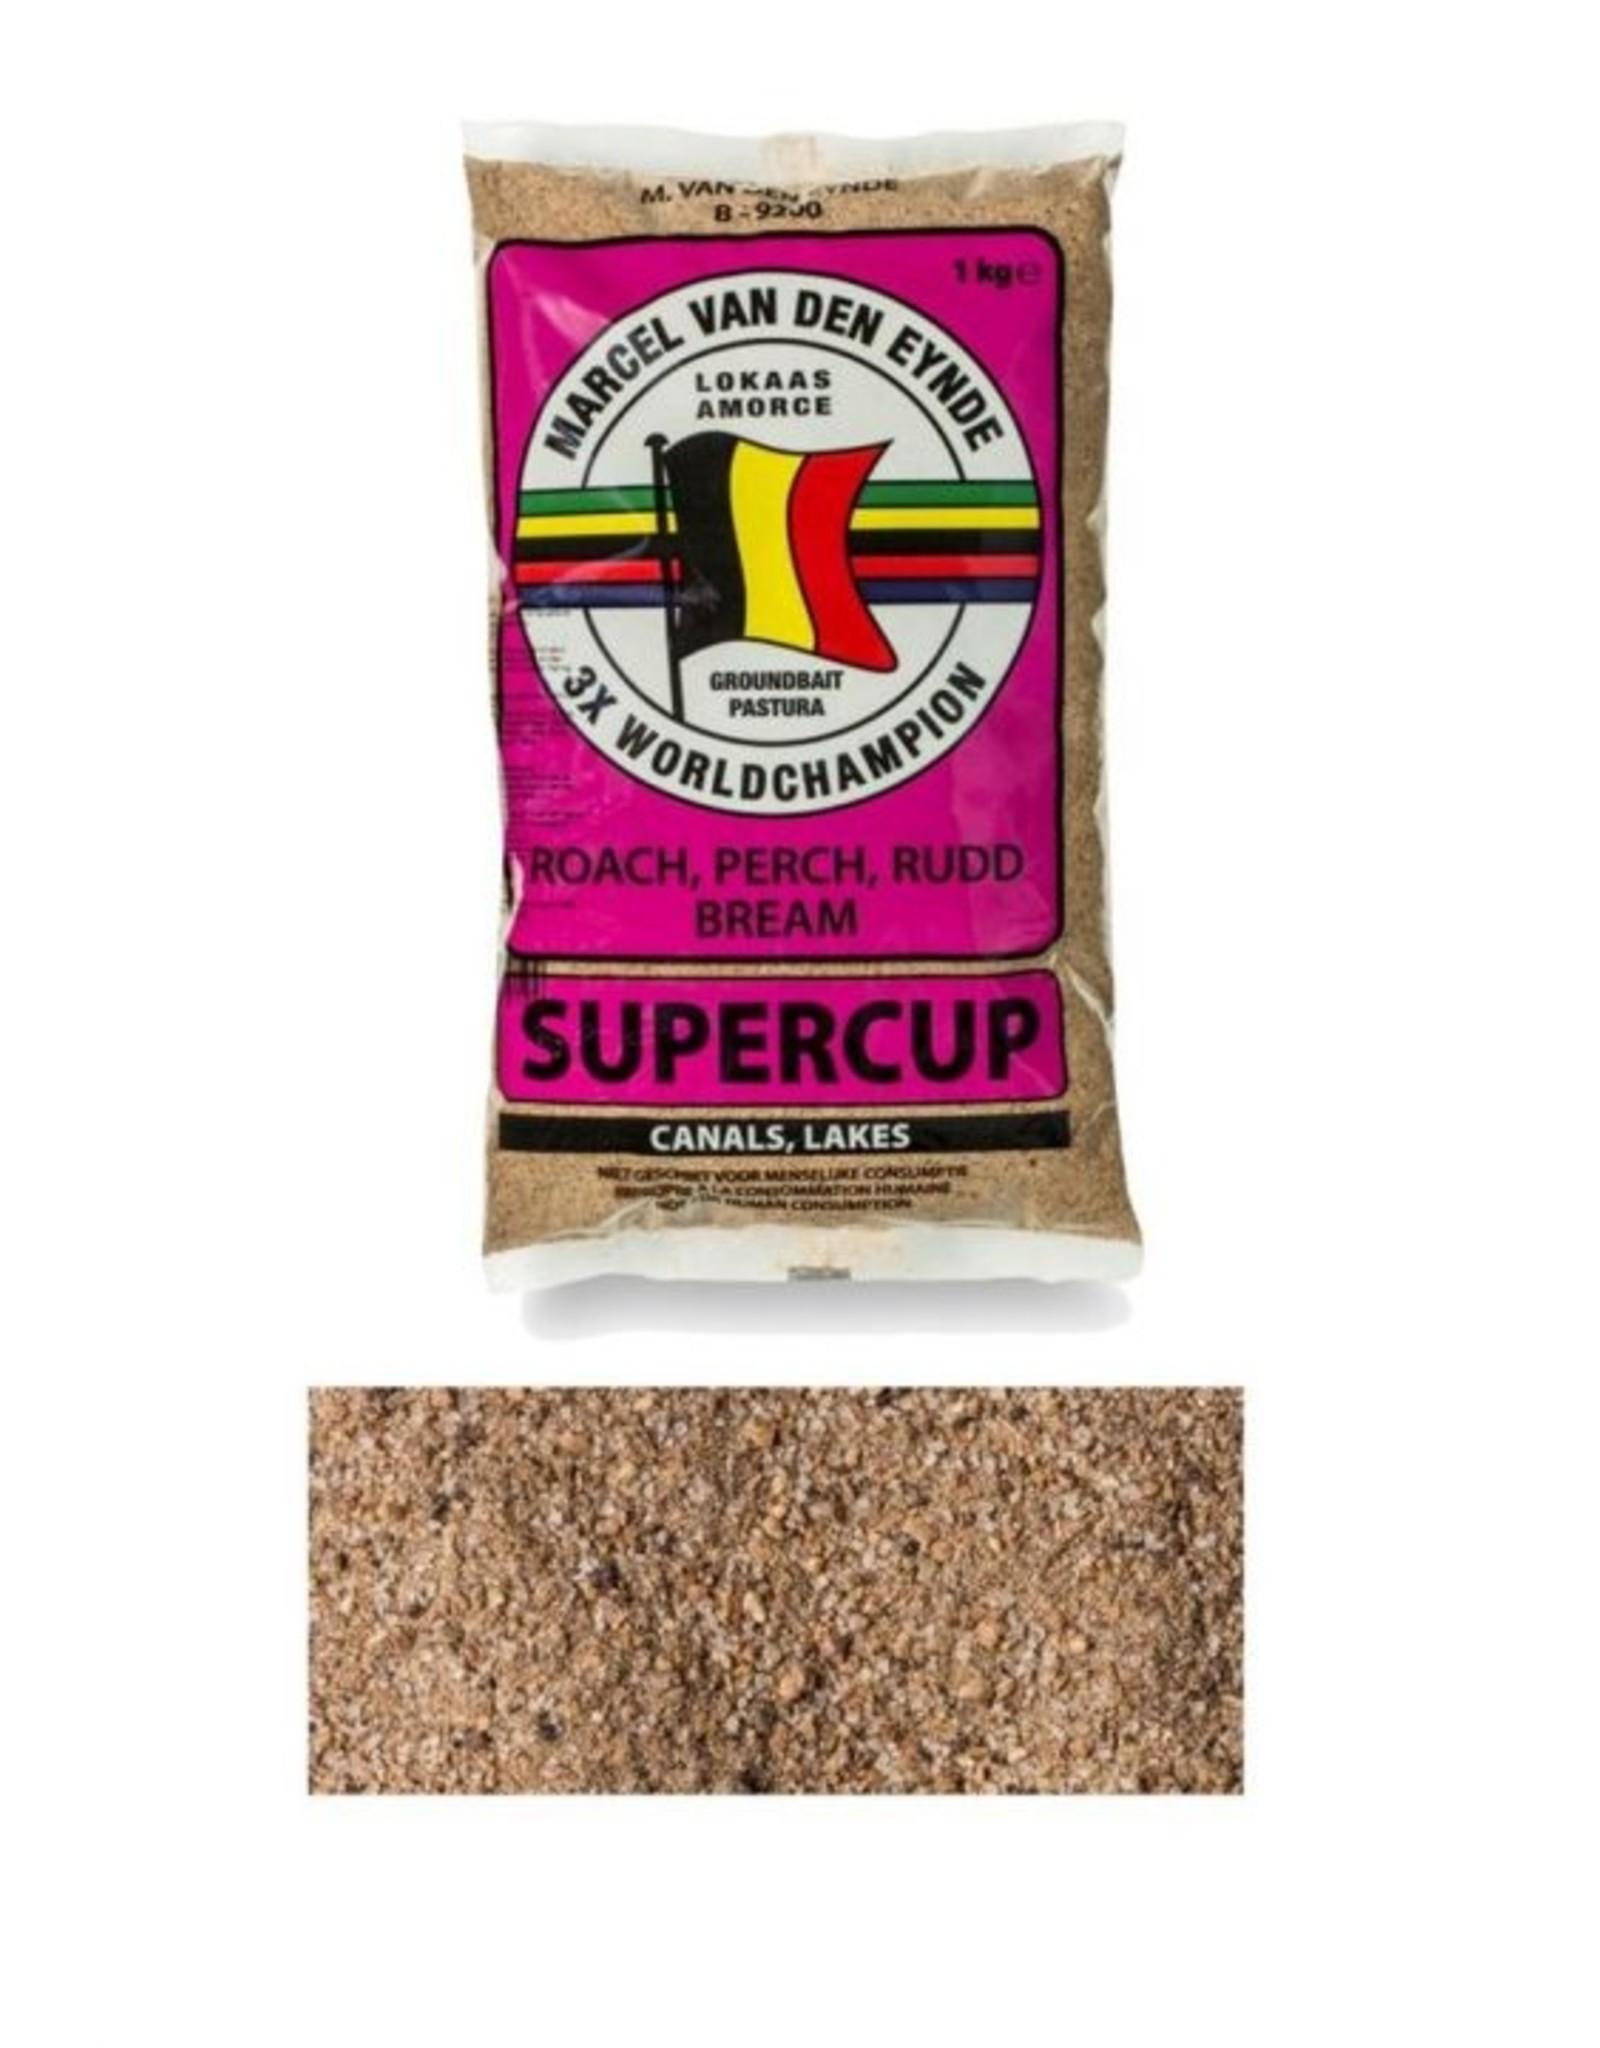 Marcel van de Eynde van den Eynde Supercup